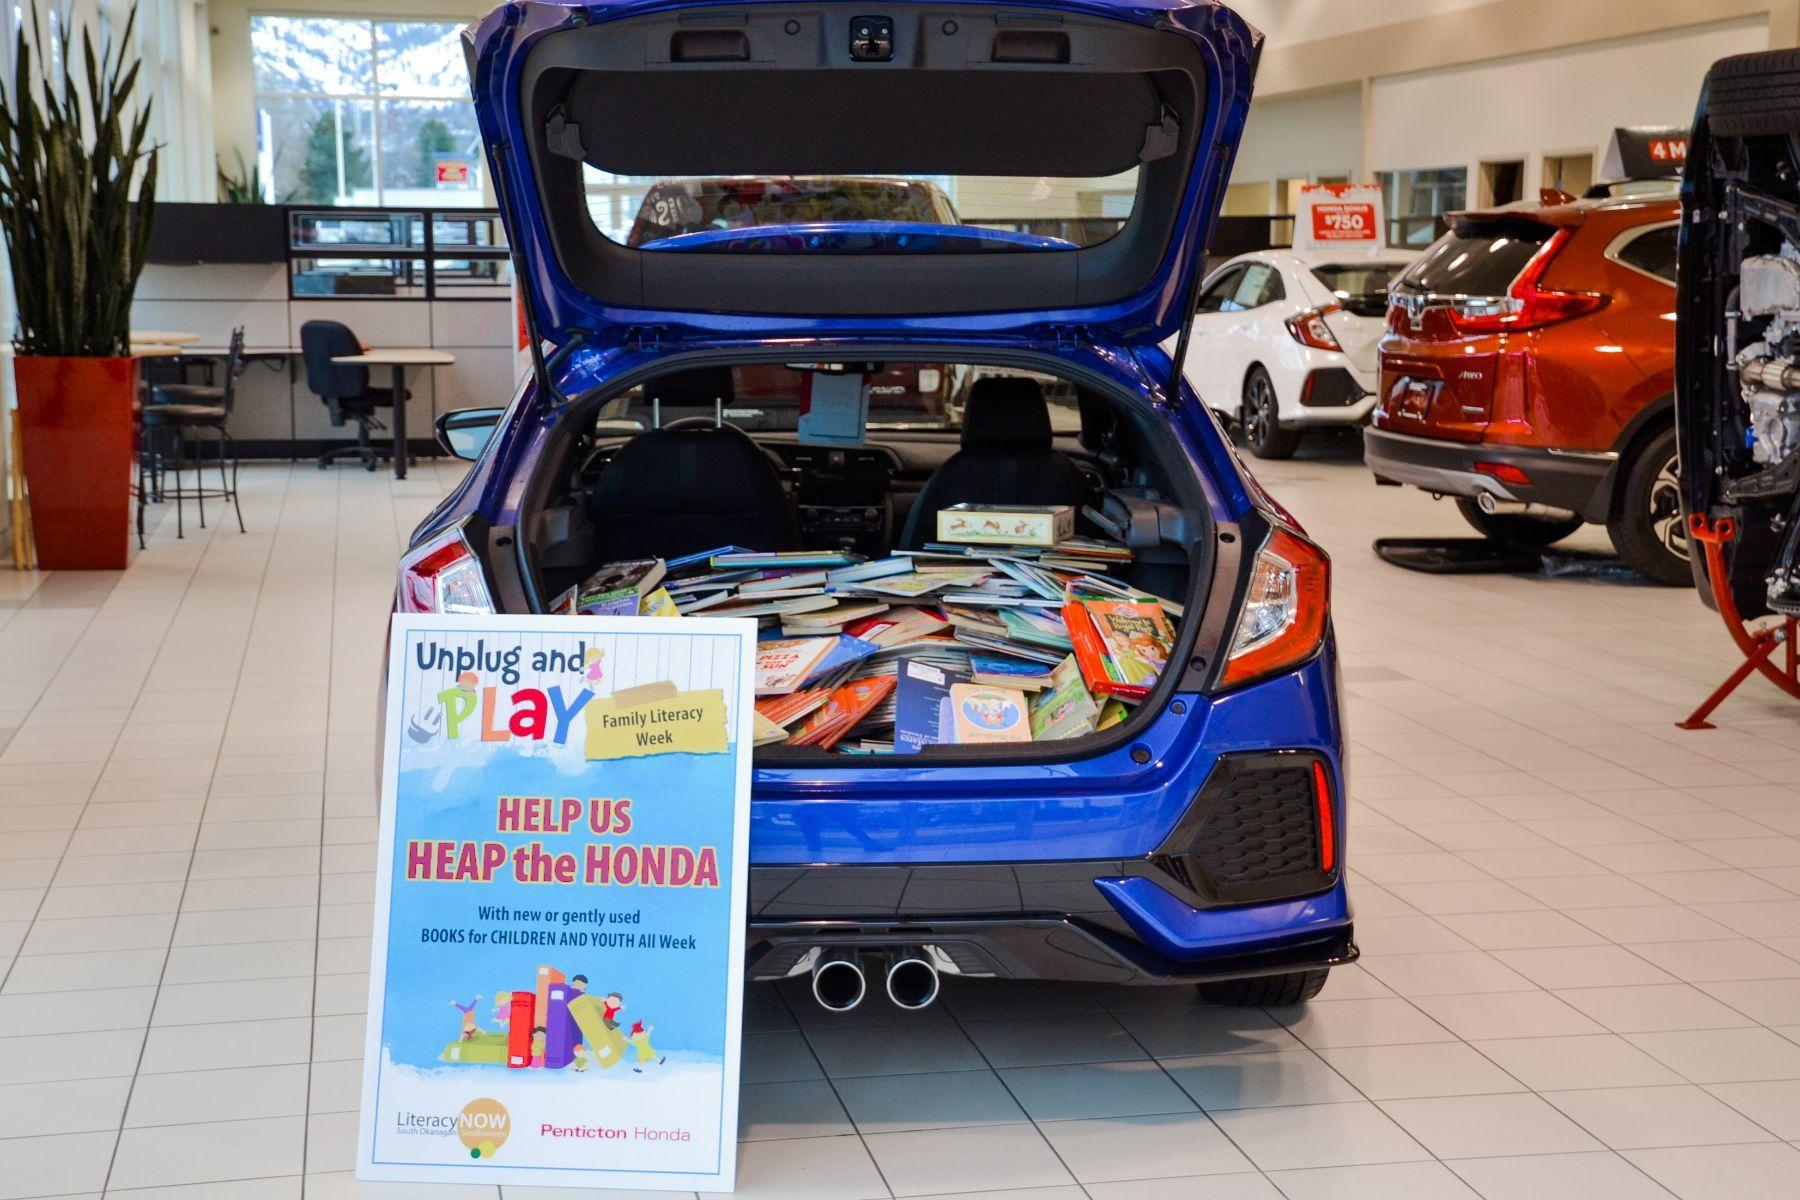 Penticton Honda 'Heaps a Honda' for Literacy Day